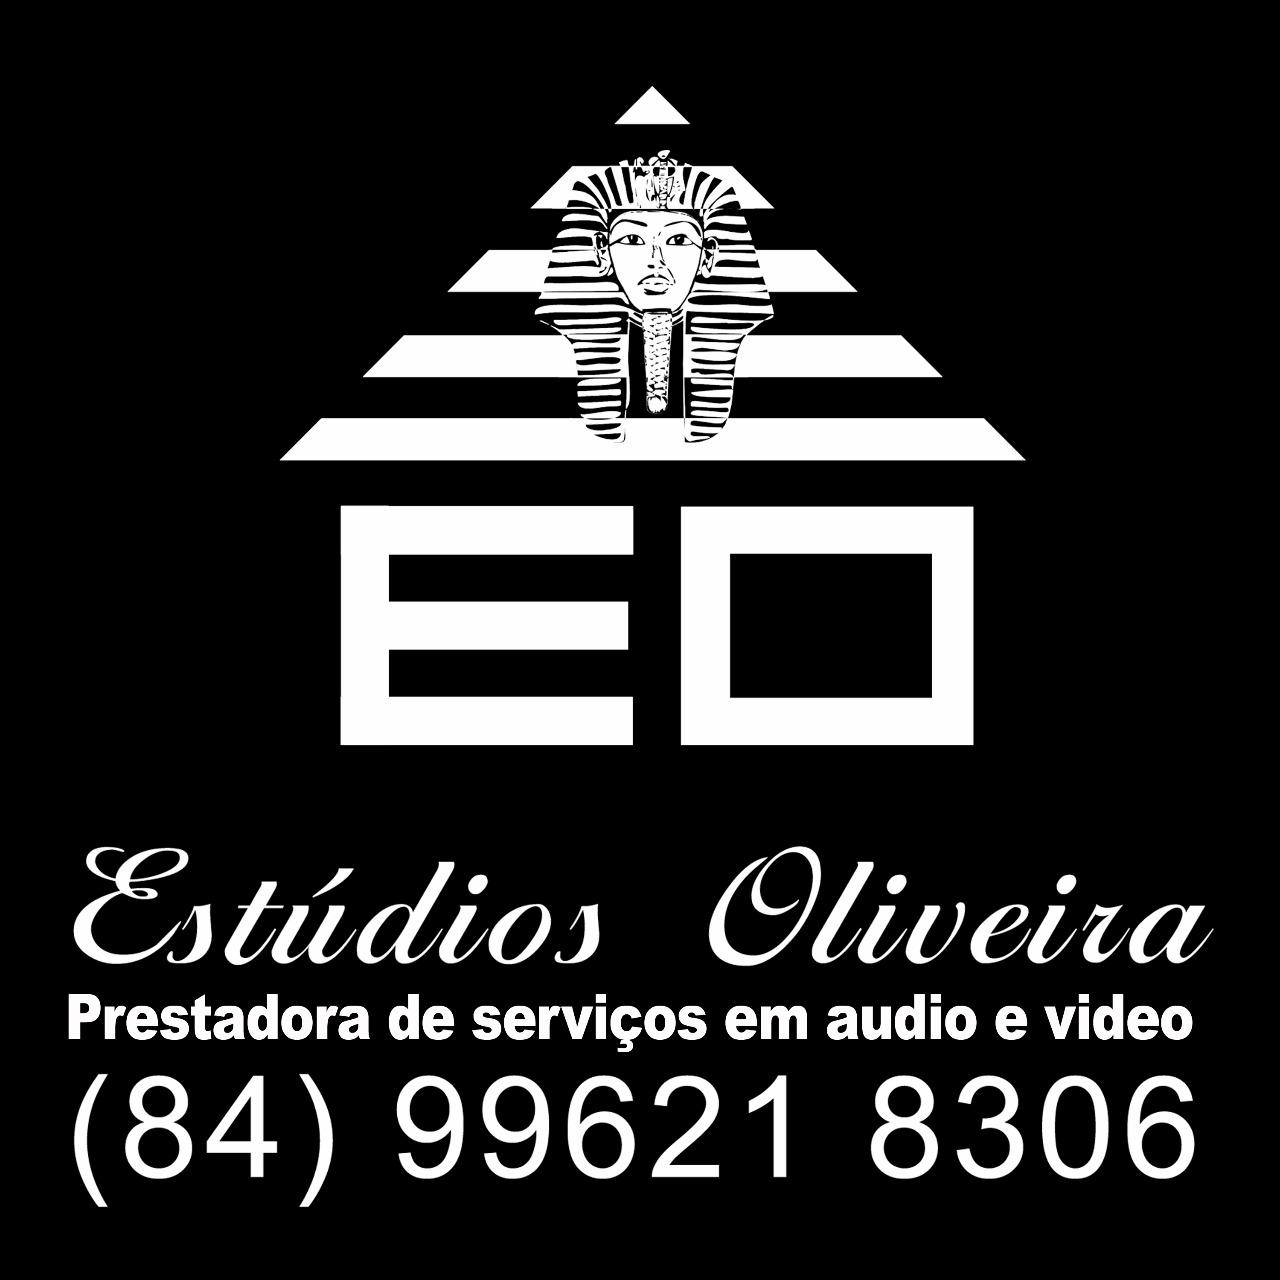 ESTÚDIOS OLIVEIRA